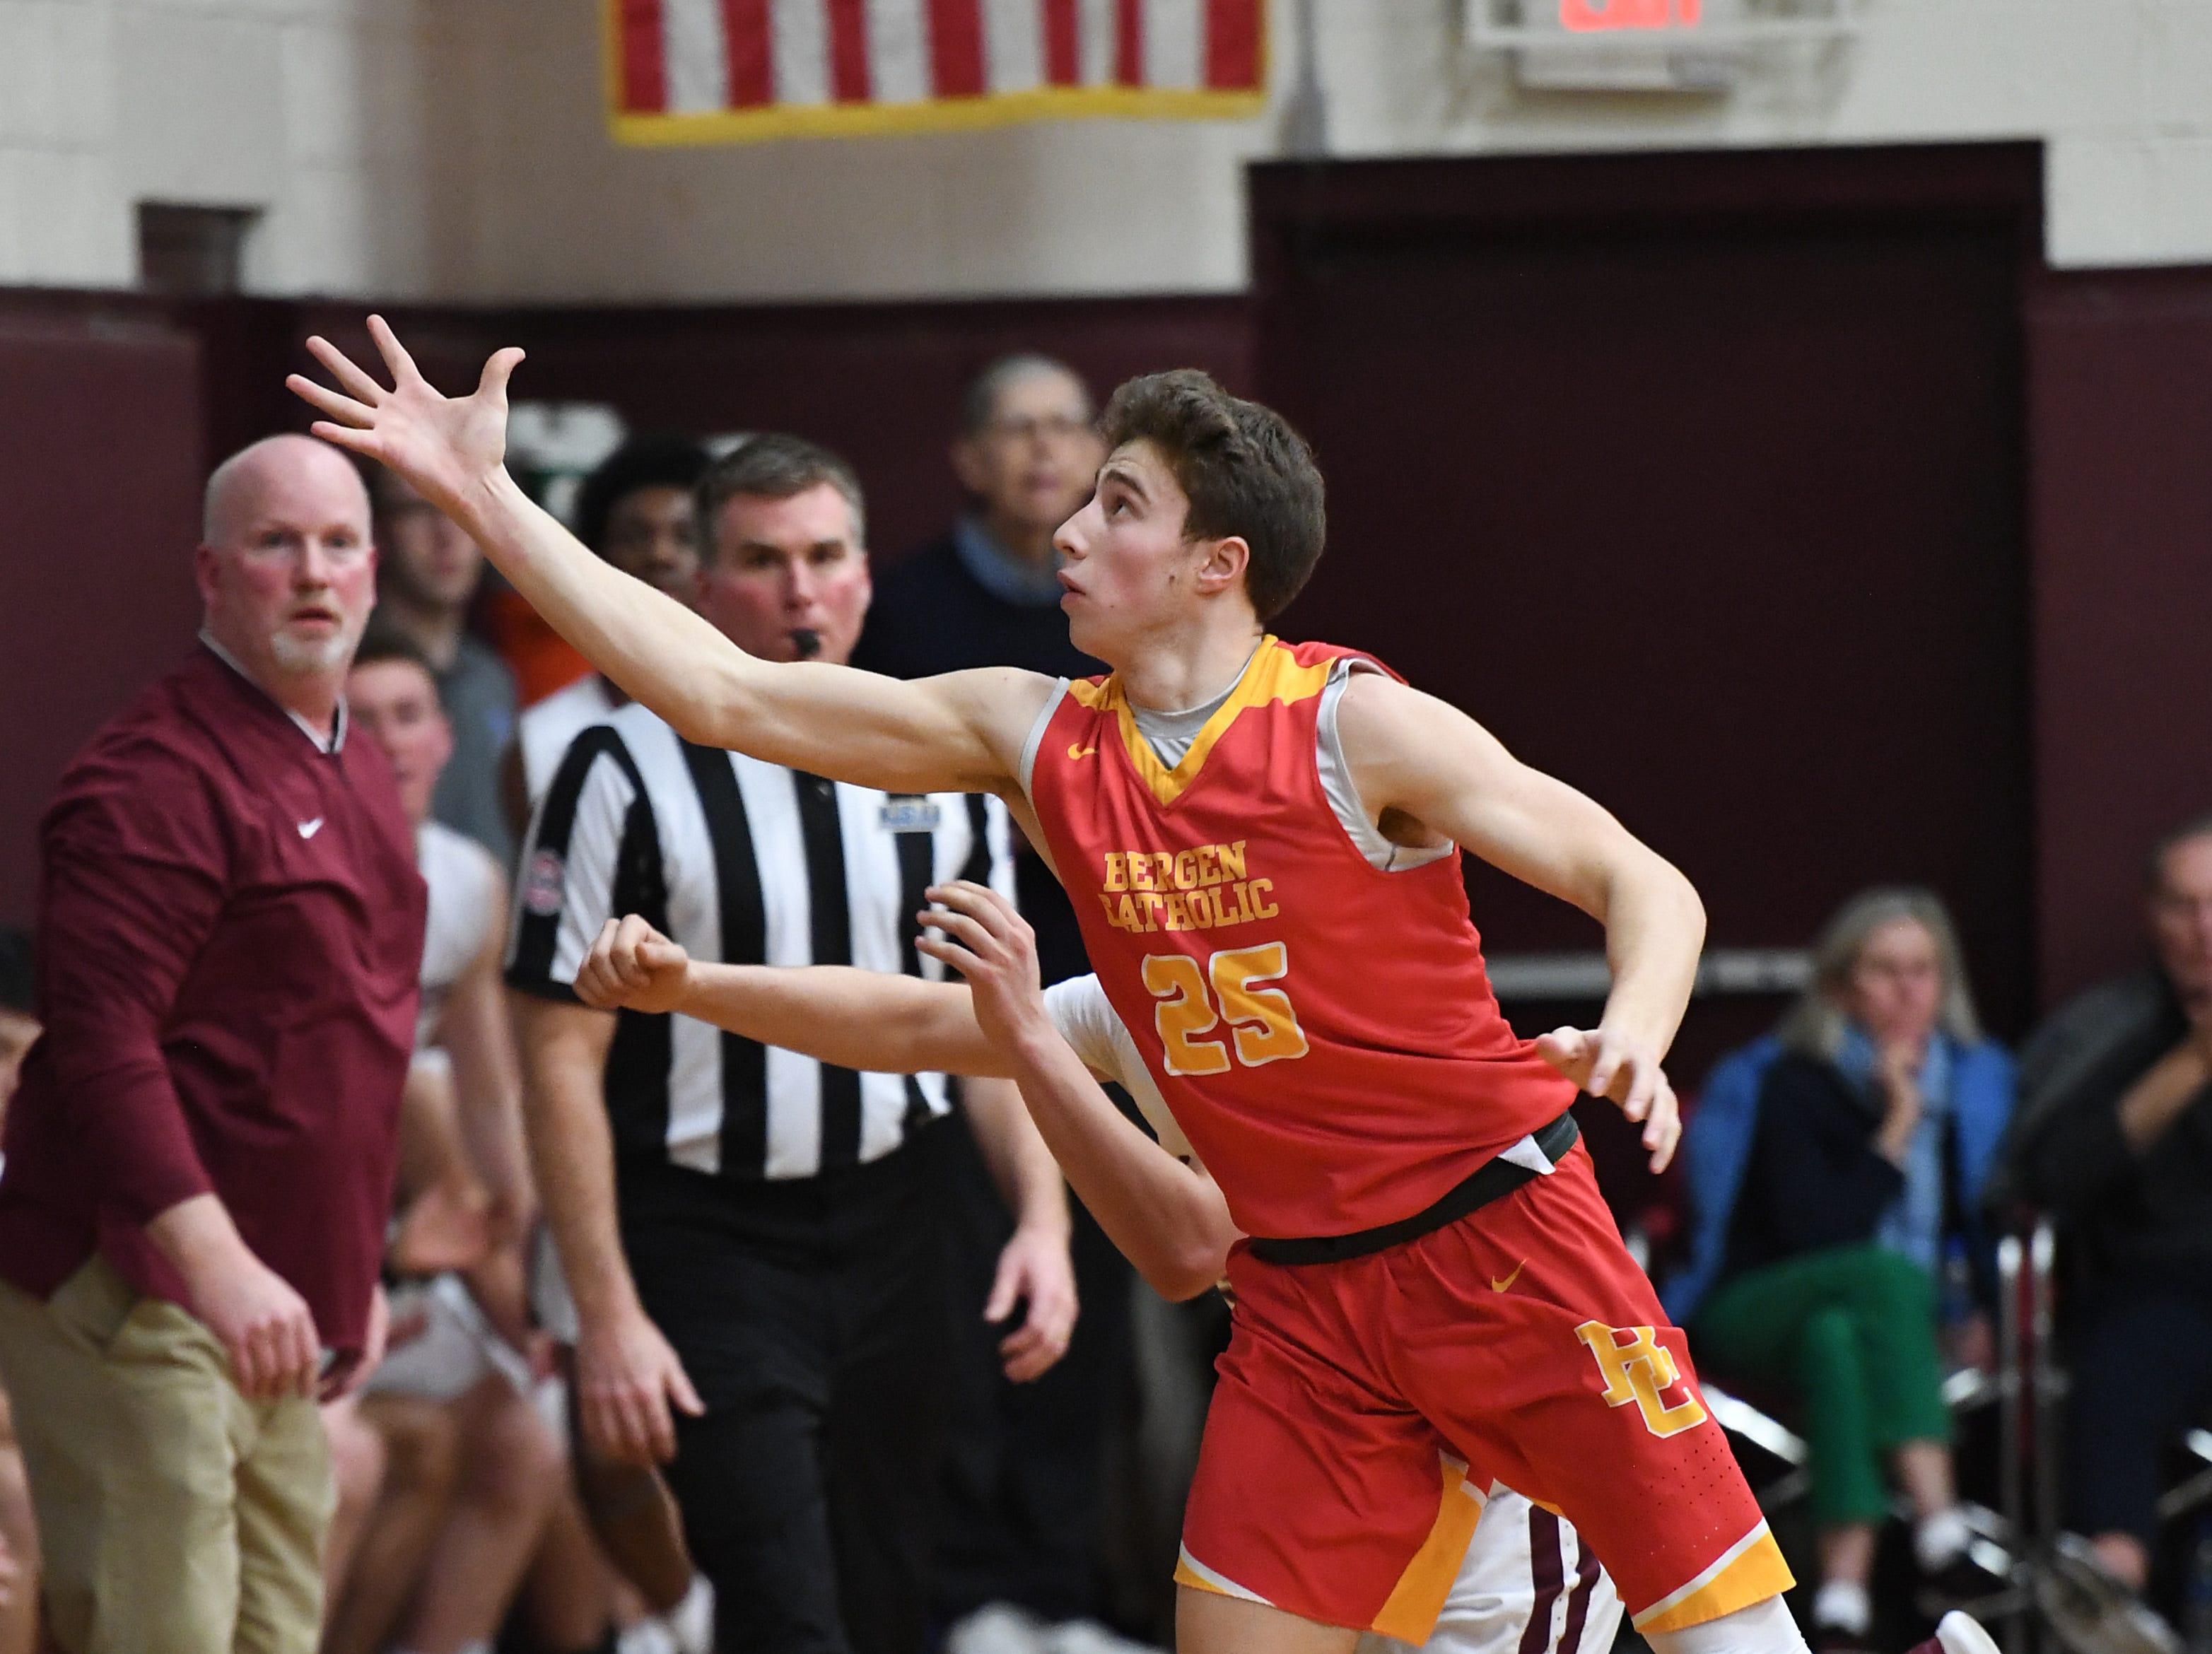 Bergen Catholic basketball at Don Bosco in Ramsey on Thursday, January 17, 2019. BC #25 Doug Edert reaches for a loose ball.